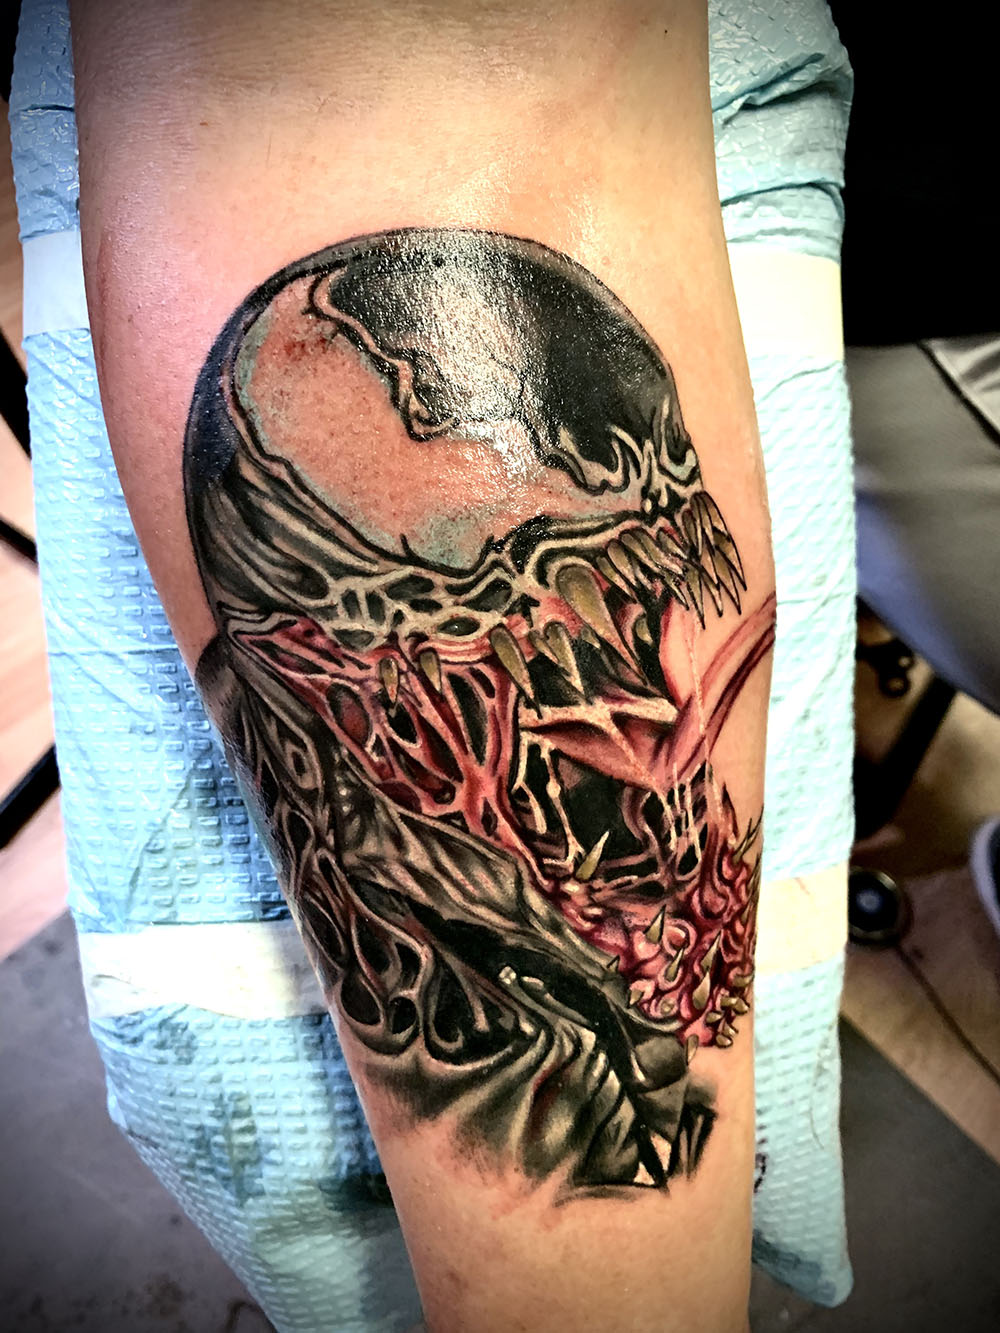 Joey Moreira,  Cloud 9 Tattoo Co